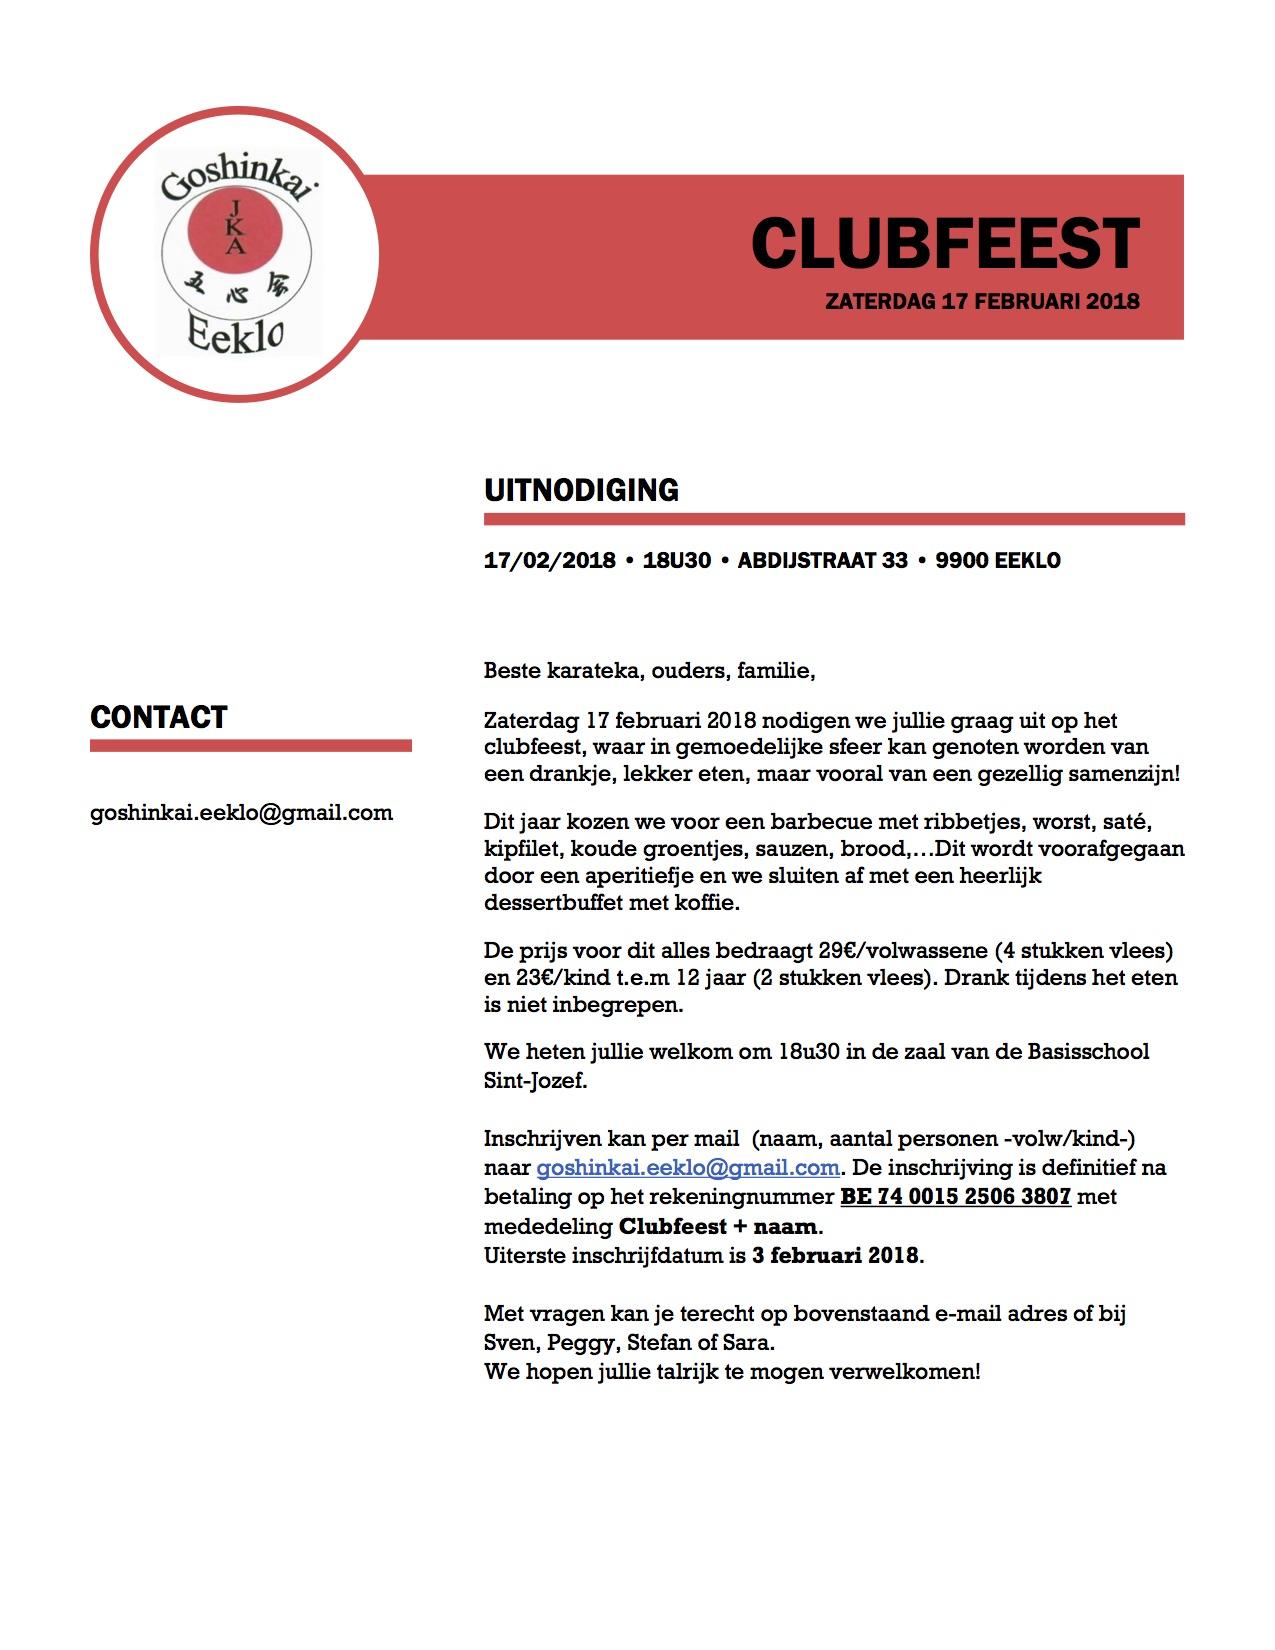 Uitnodiging Clubfeest Goshinkai 2018 - DEFINITIEF